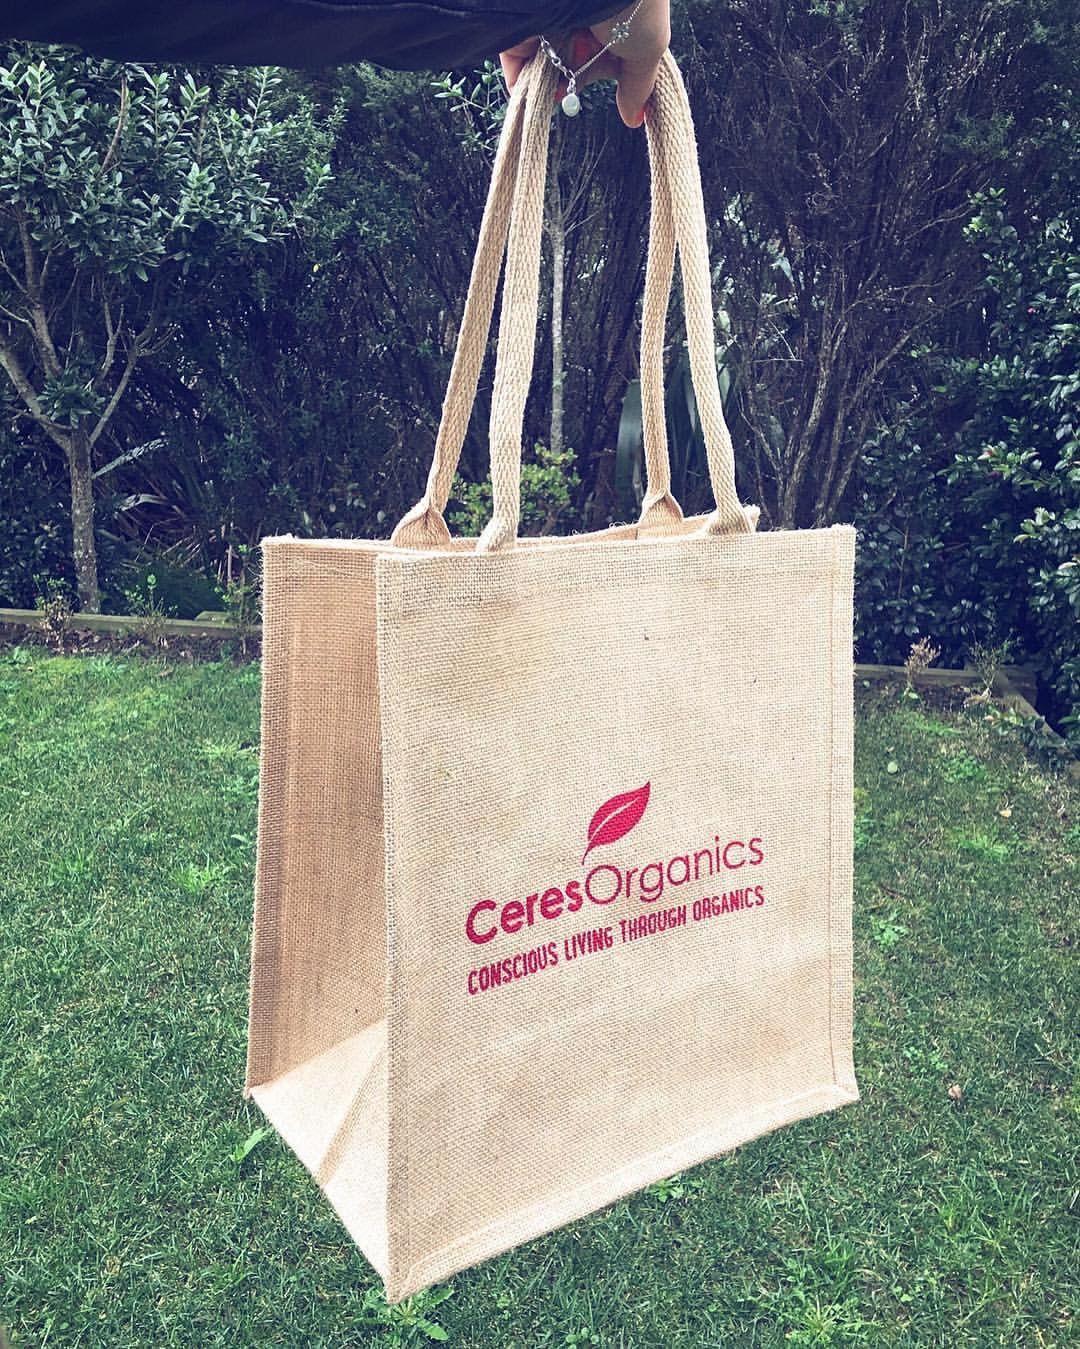 Eco Bags Reusable Friendly Ceres Organics Ecobags Co Nz O R G A N I C Pinterest And Bag